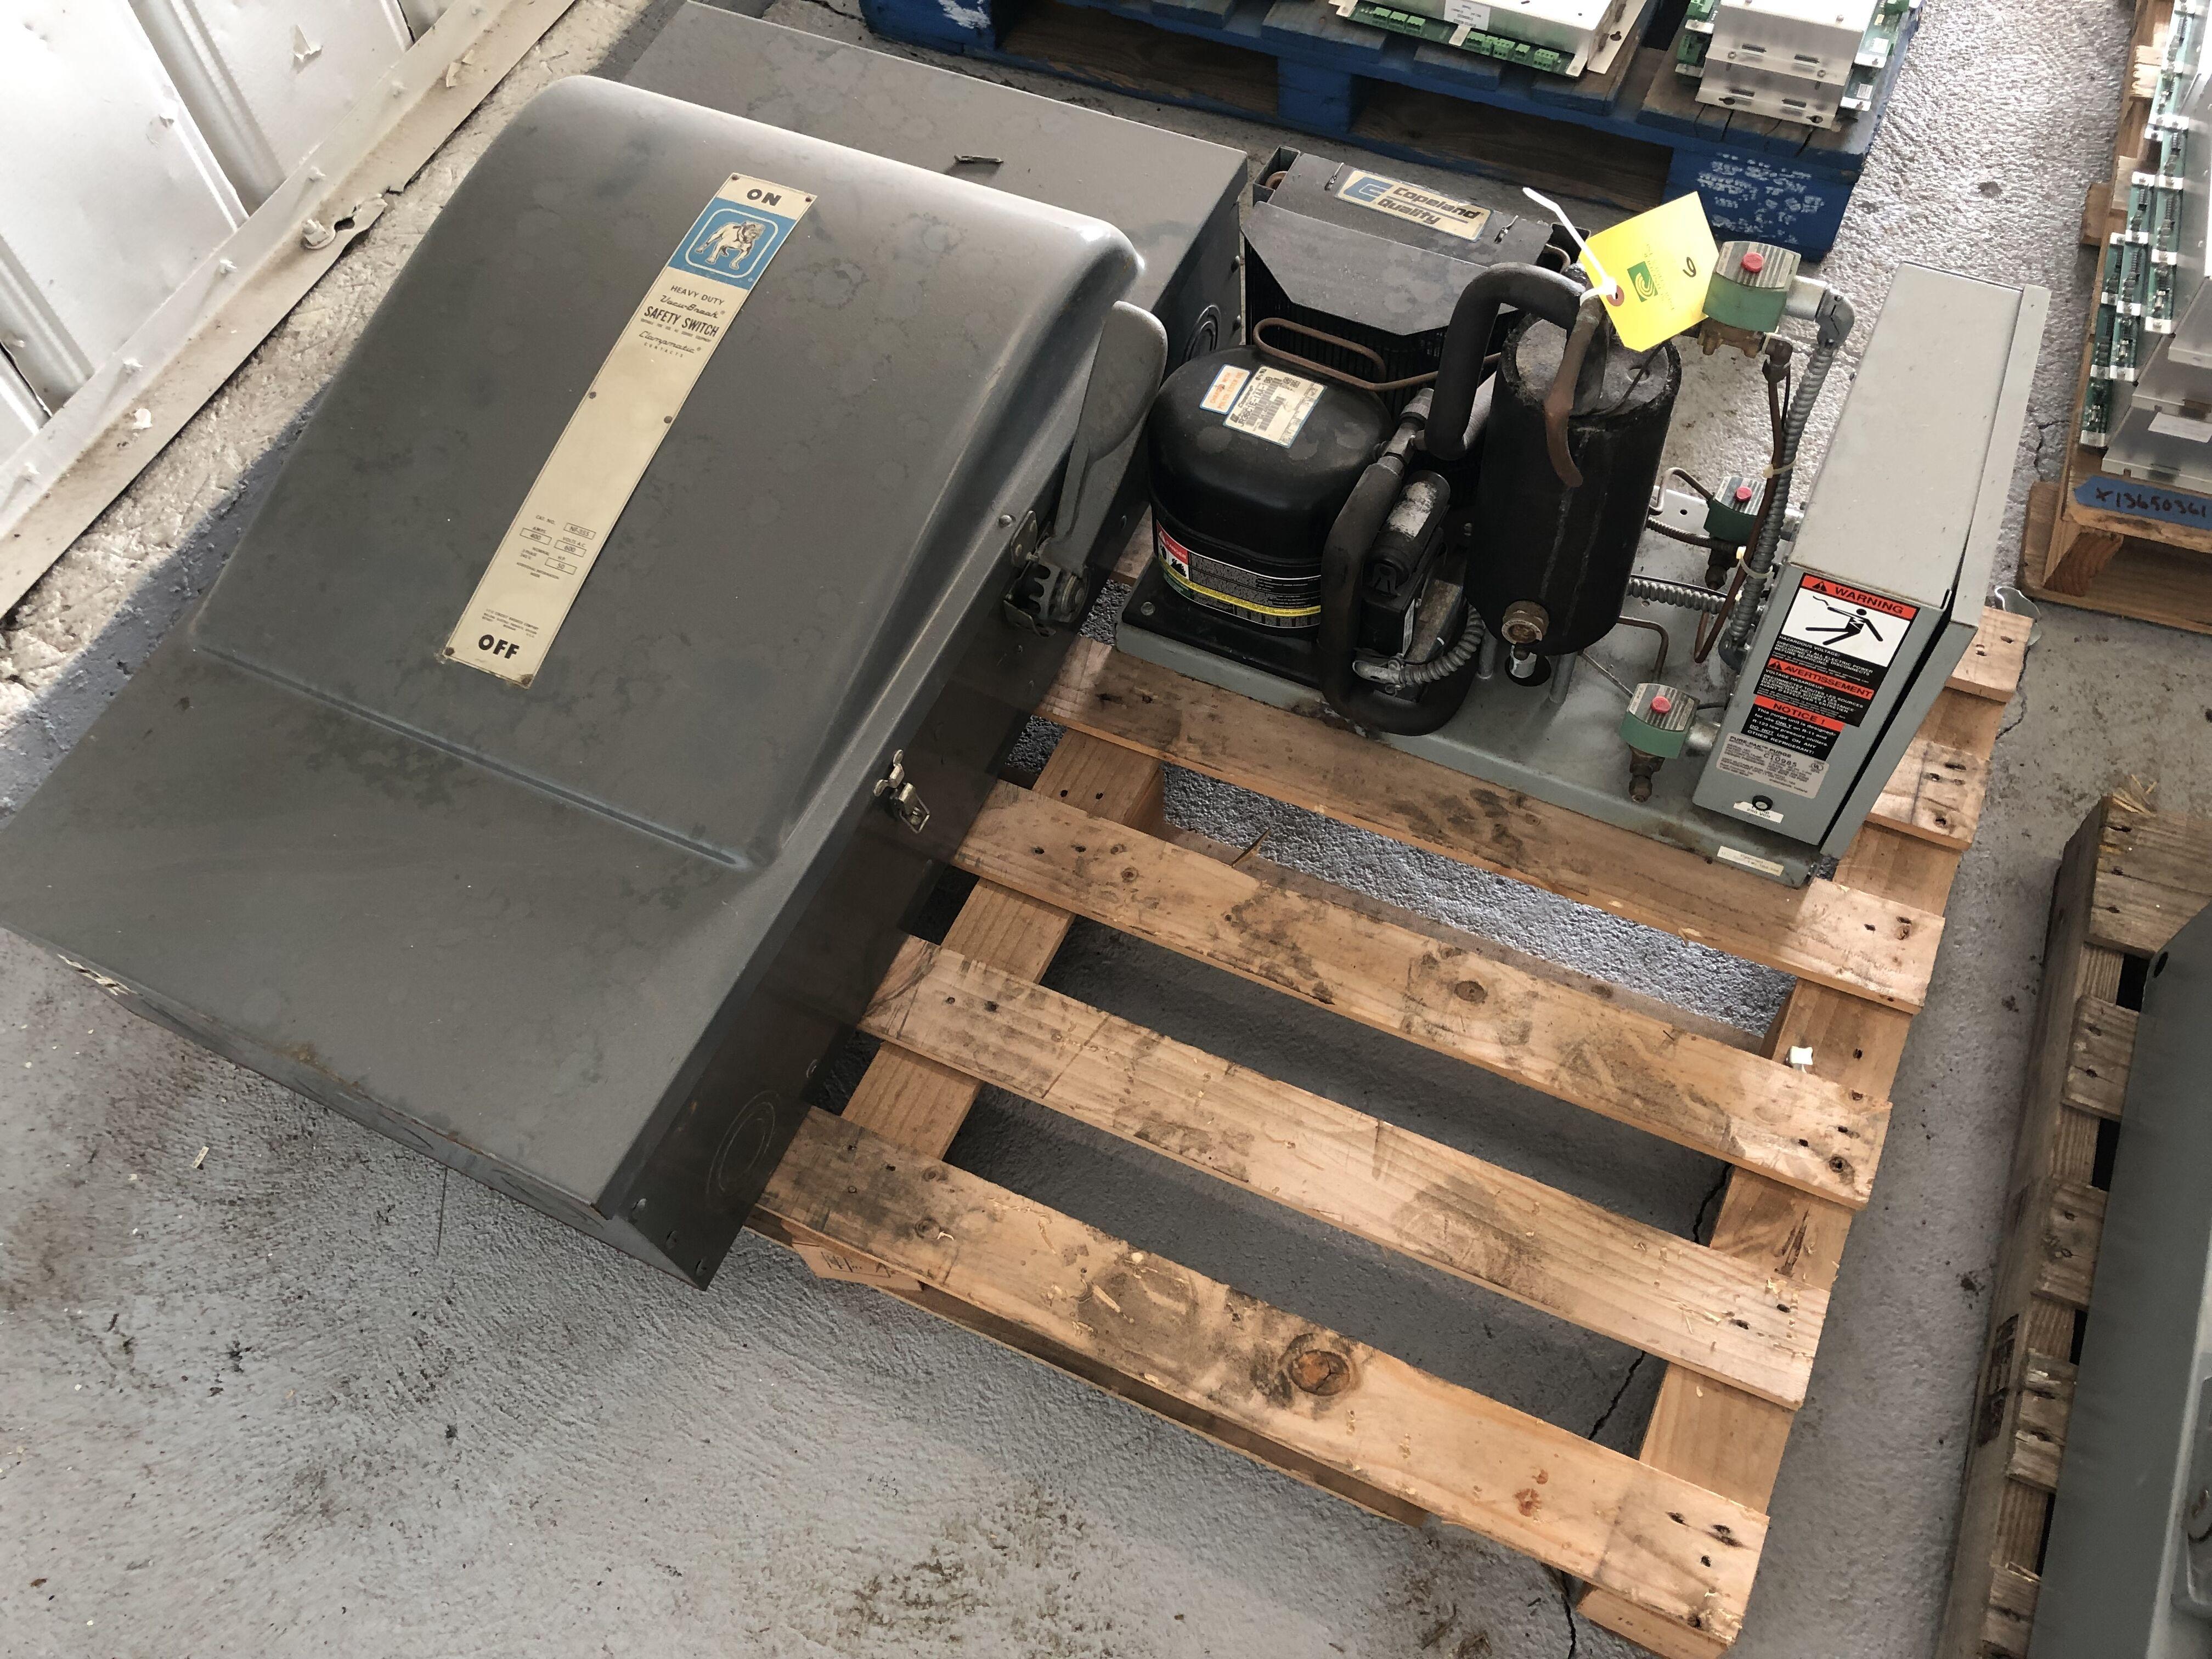 Lot 6 - Copeland Quality, Model #JR36C1E-1AA-100, Heavy Duty Safety Switch